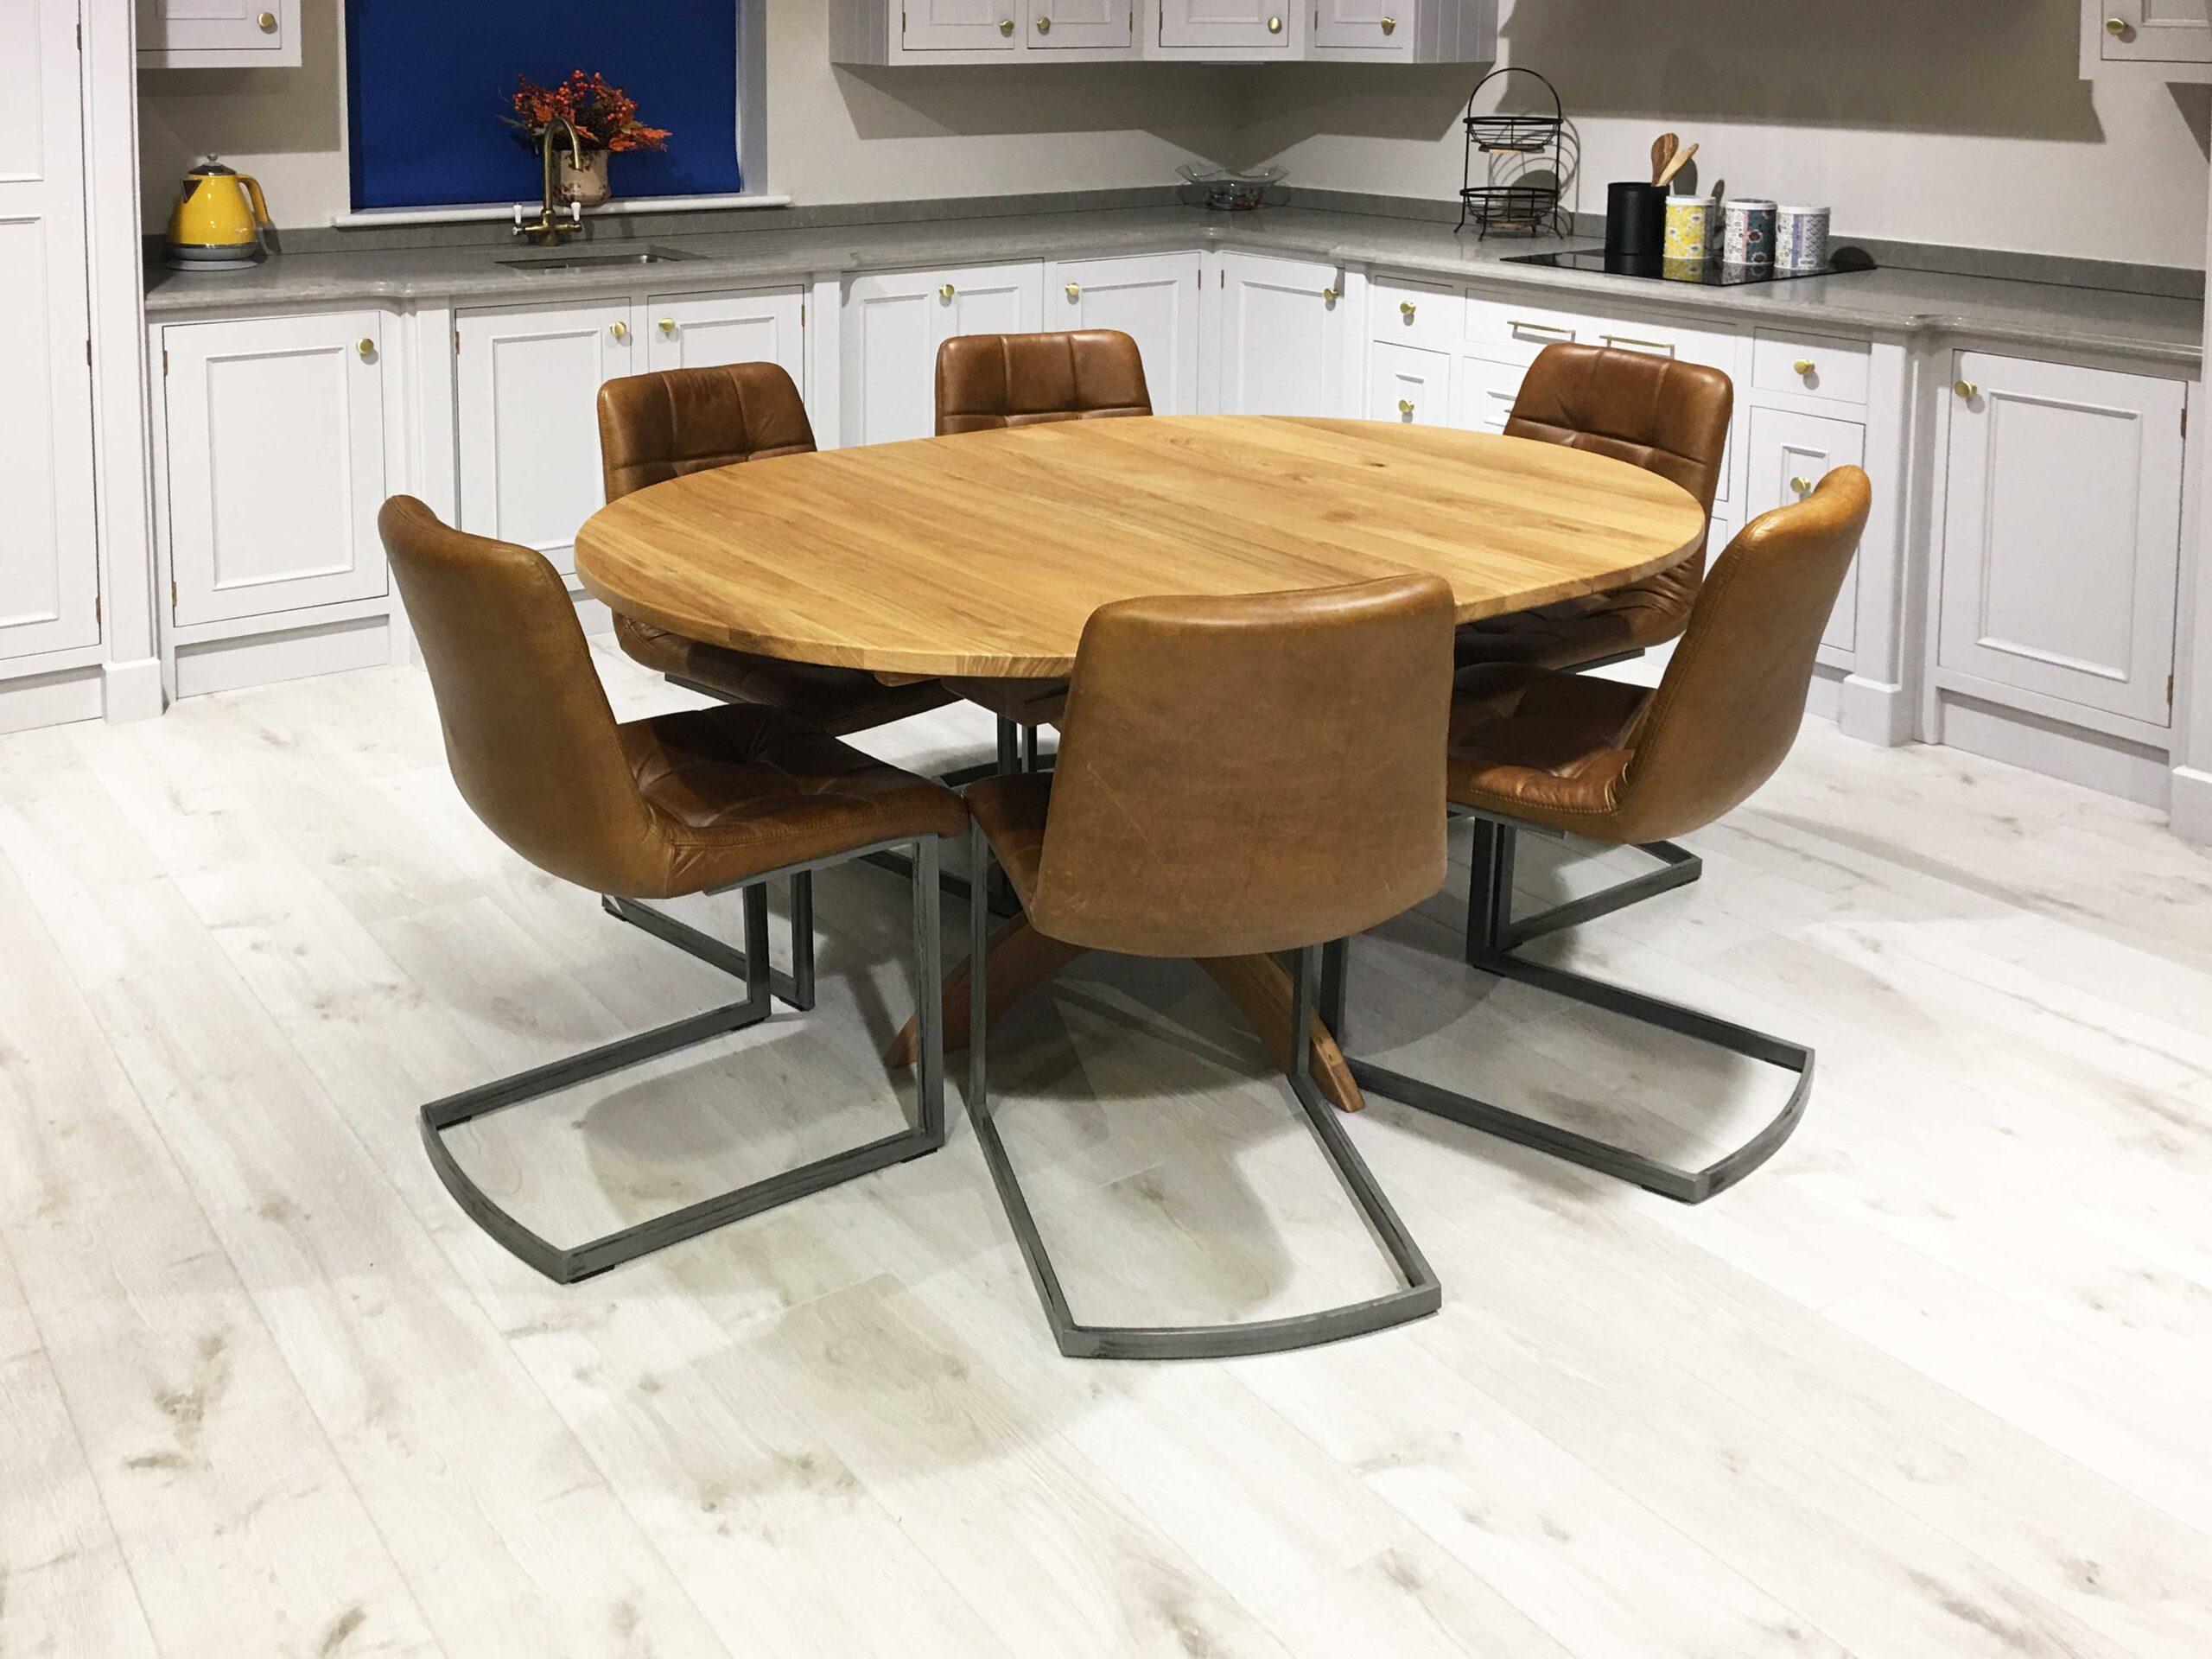 Oak-Round-Flip-Top-Single-Pedestal-Table-1200-x-1200-to-1600-x-1200